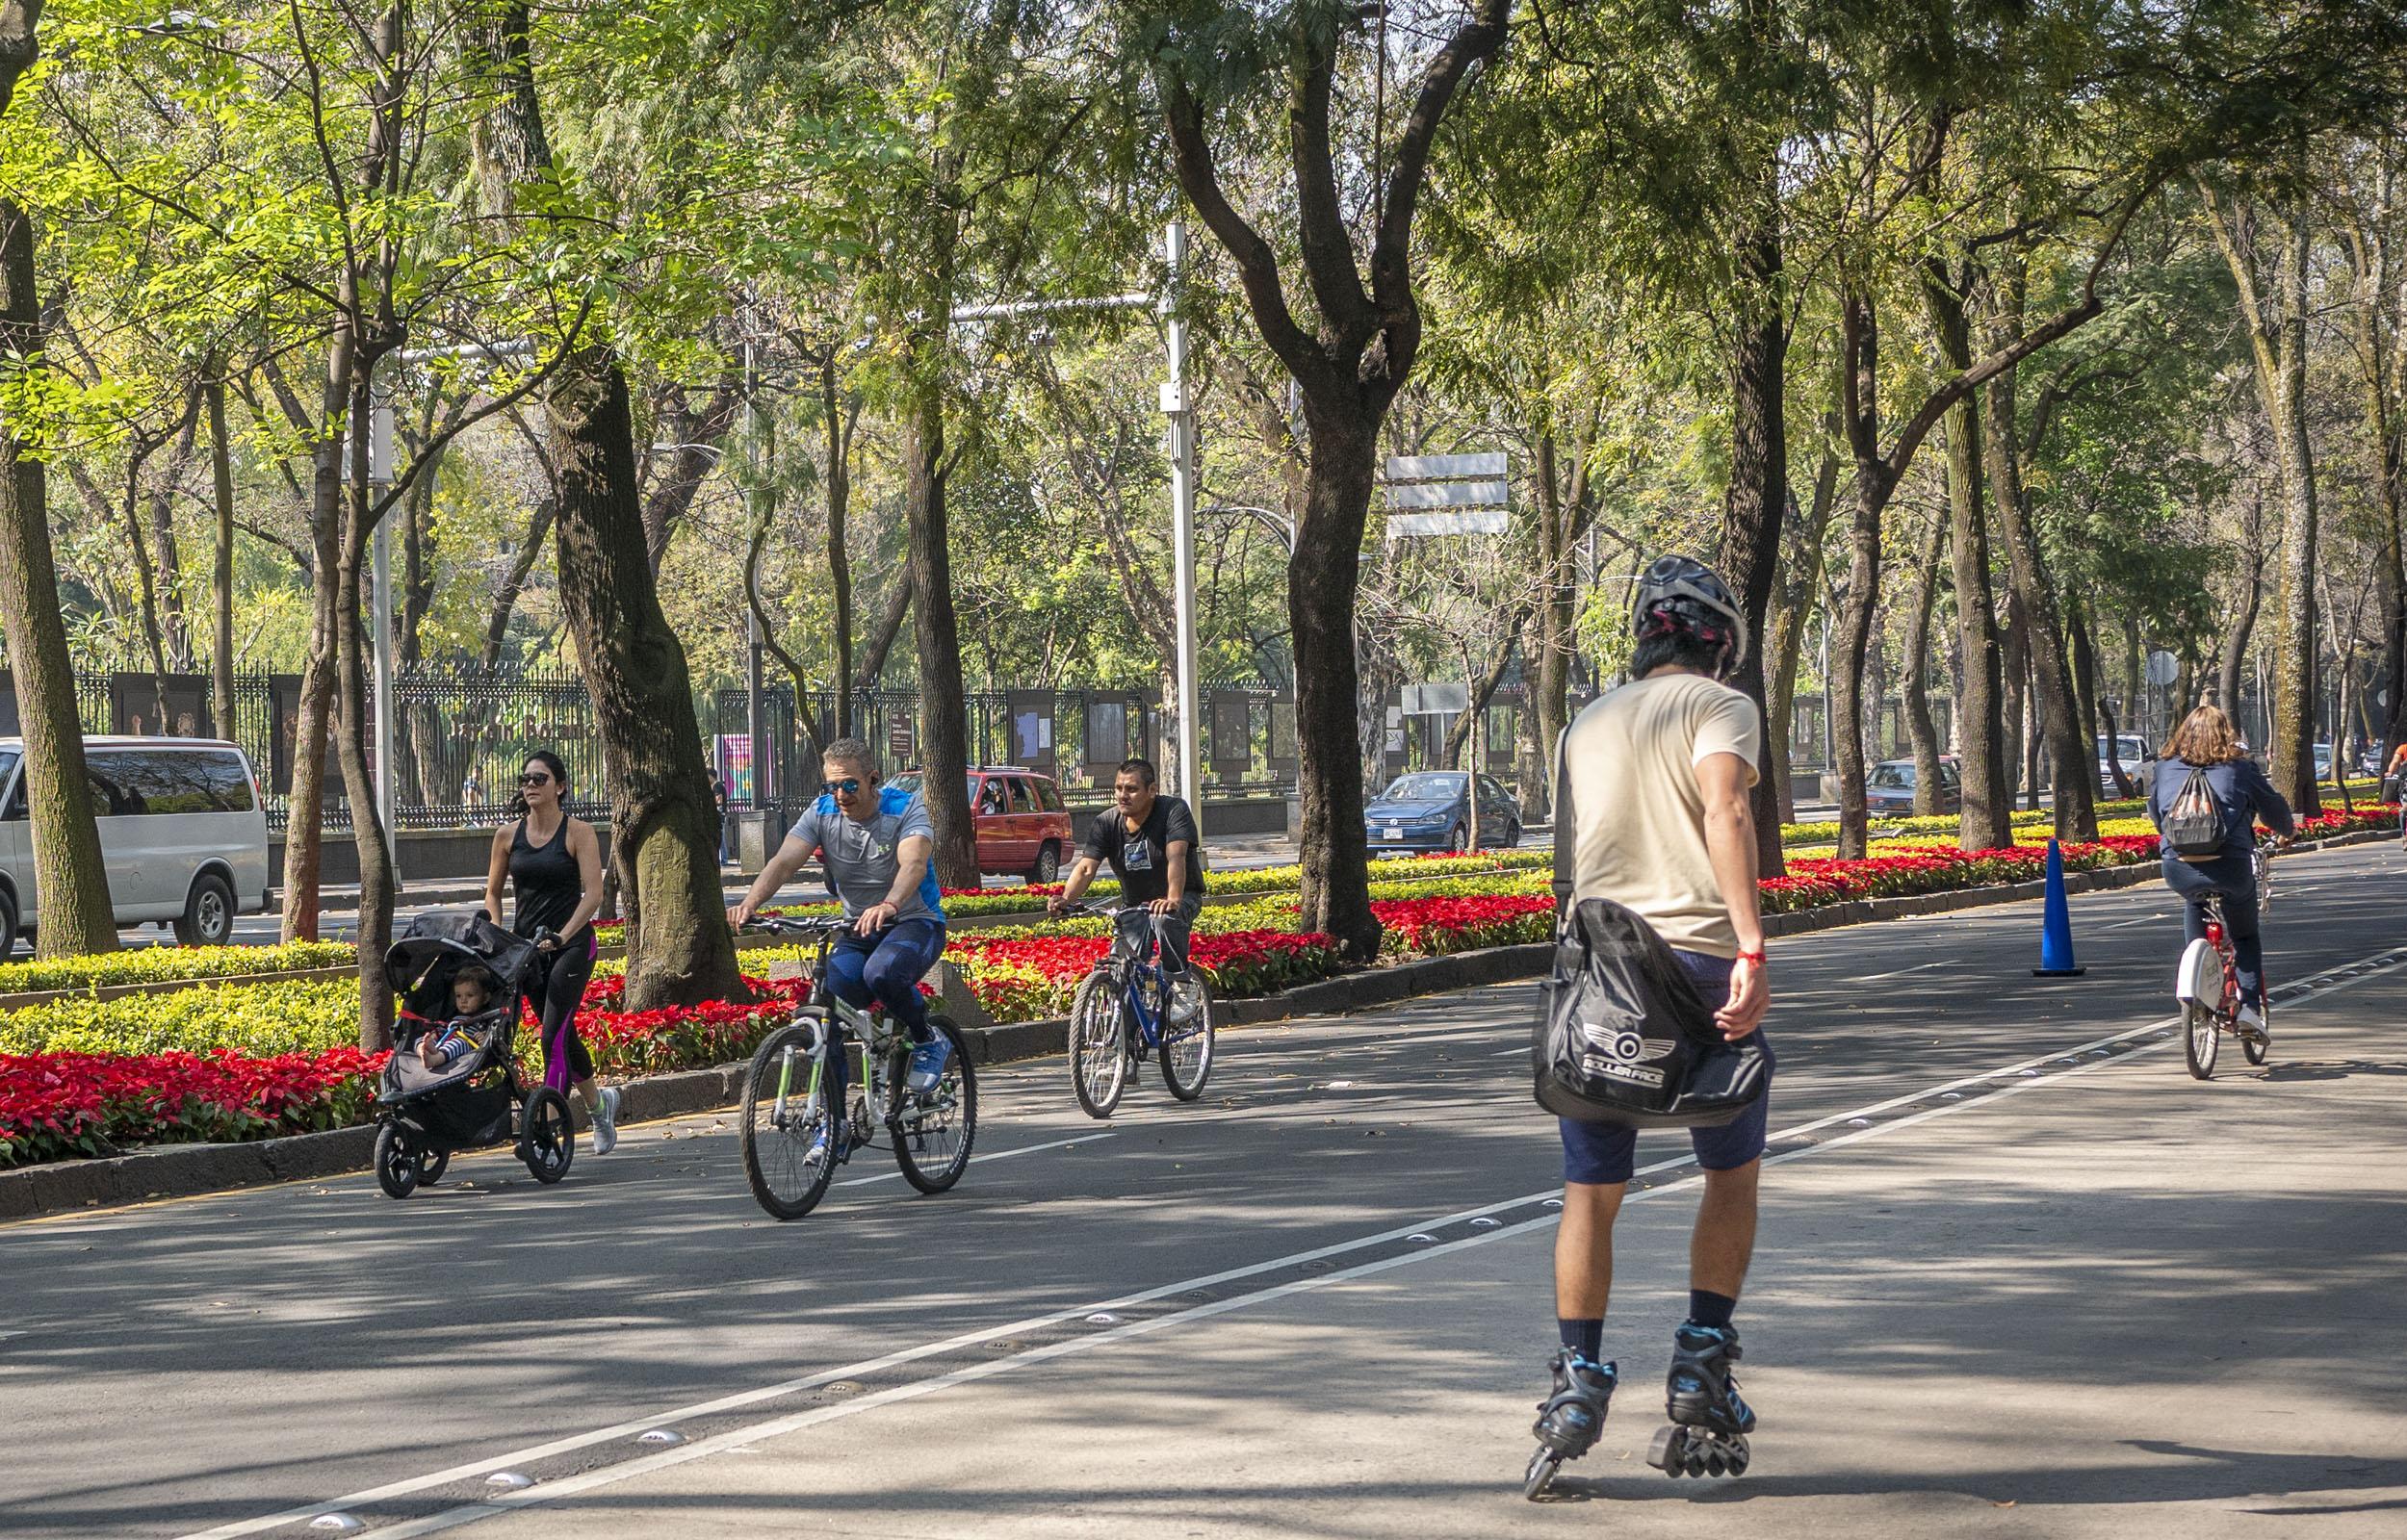 Sunday Bike Rides in Mexico City - Paseo de la Reforma